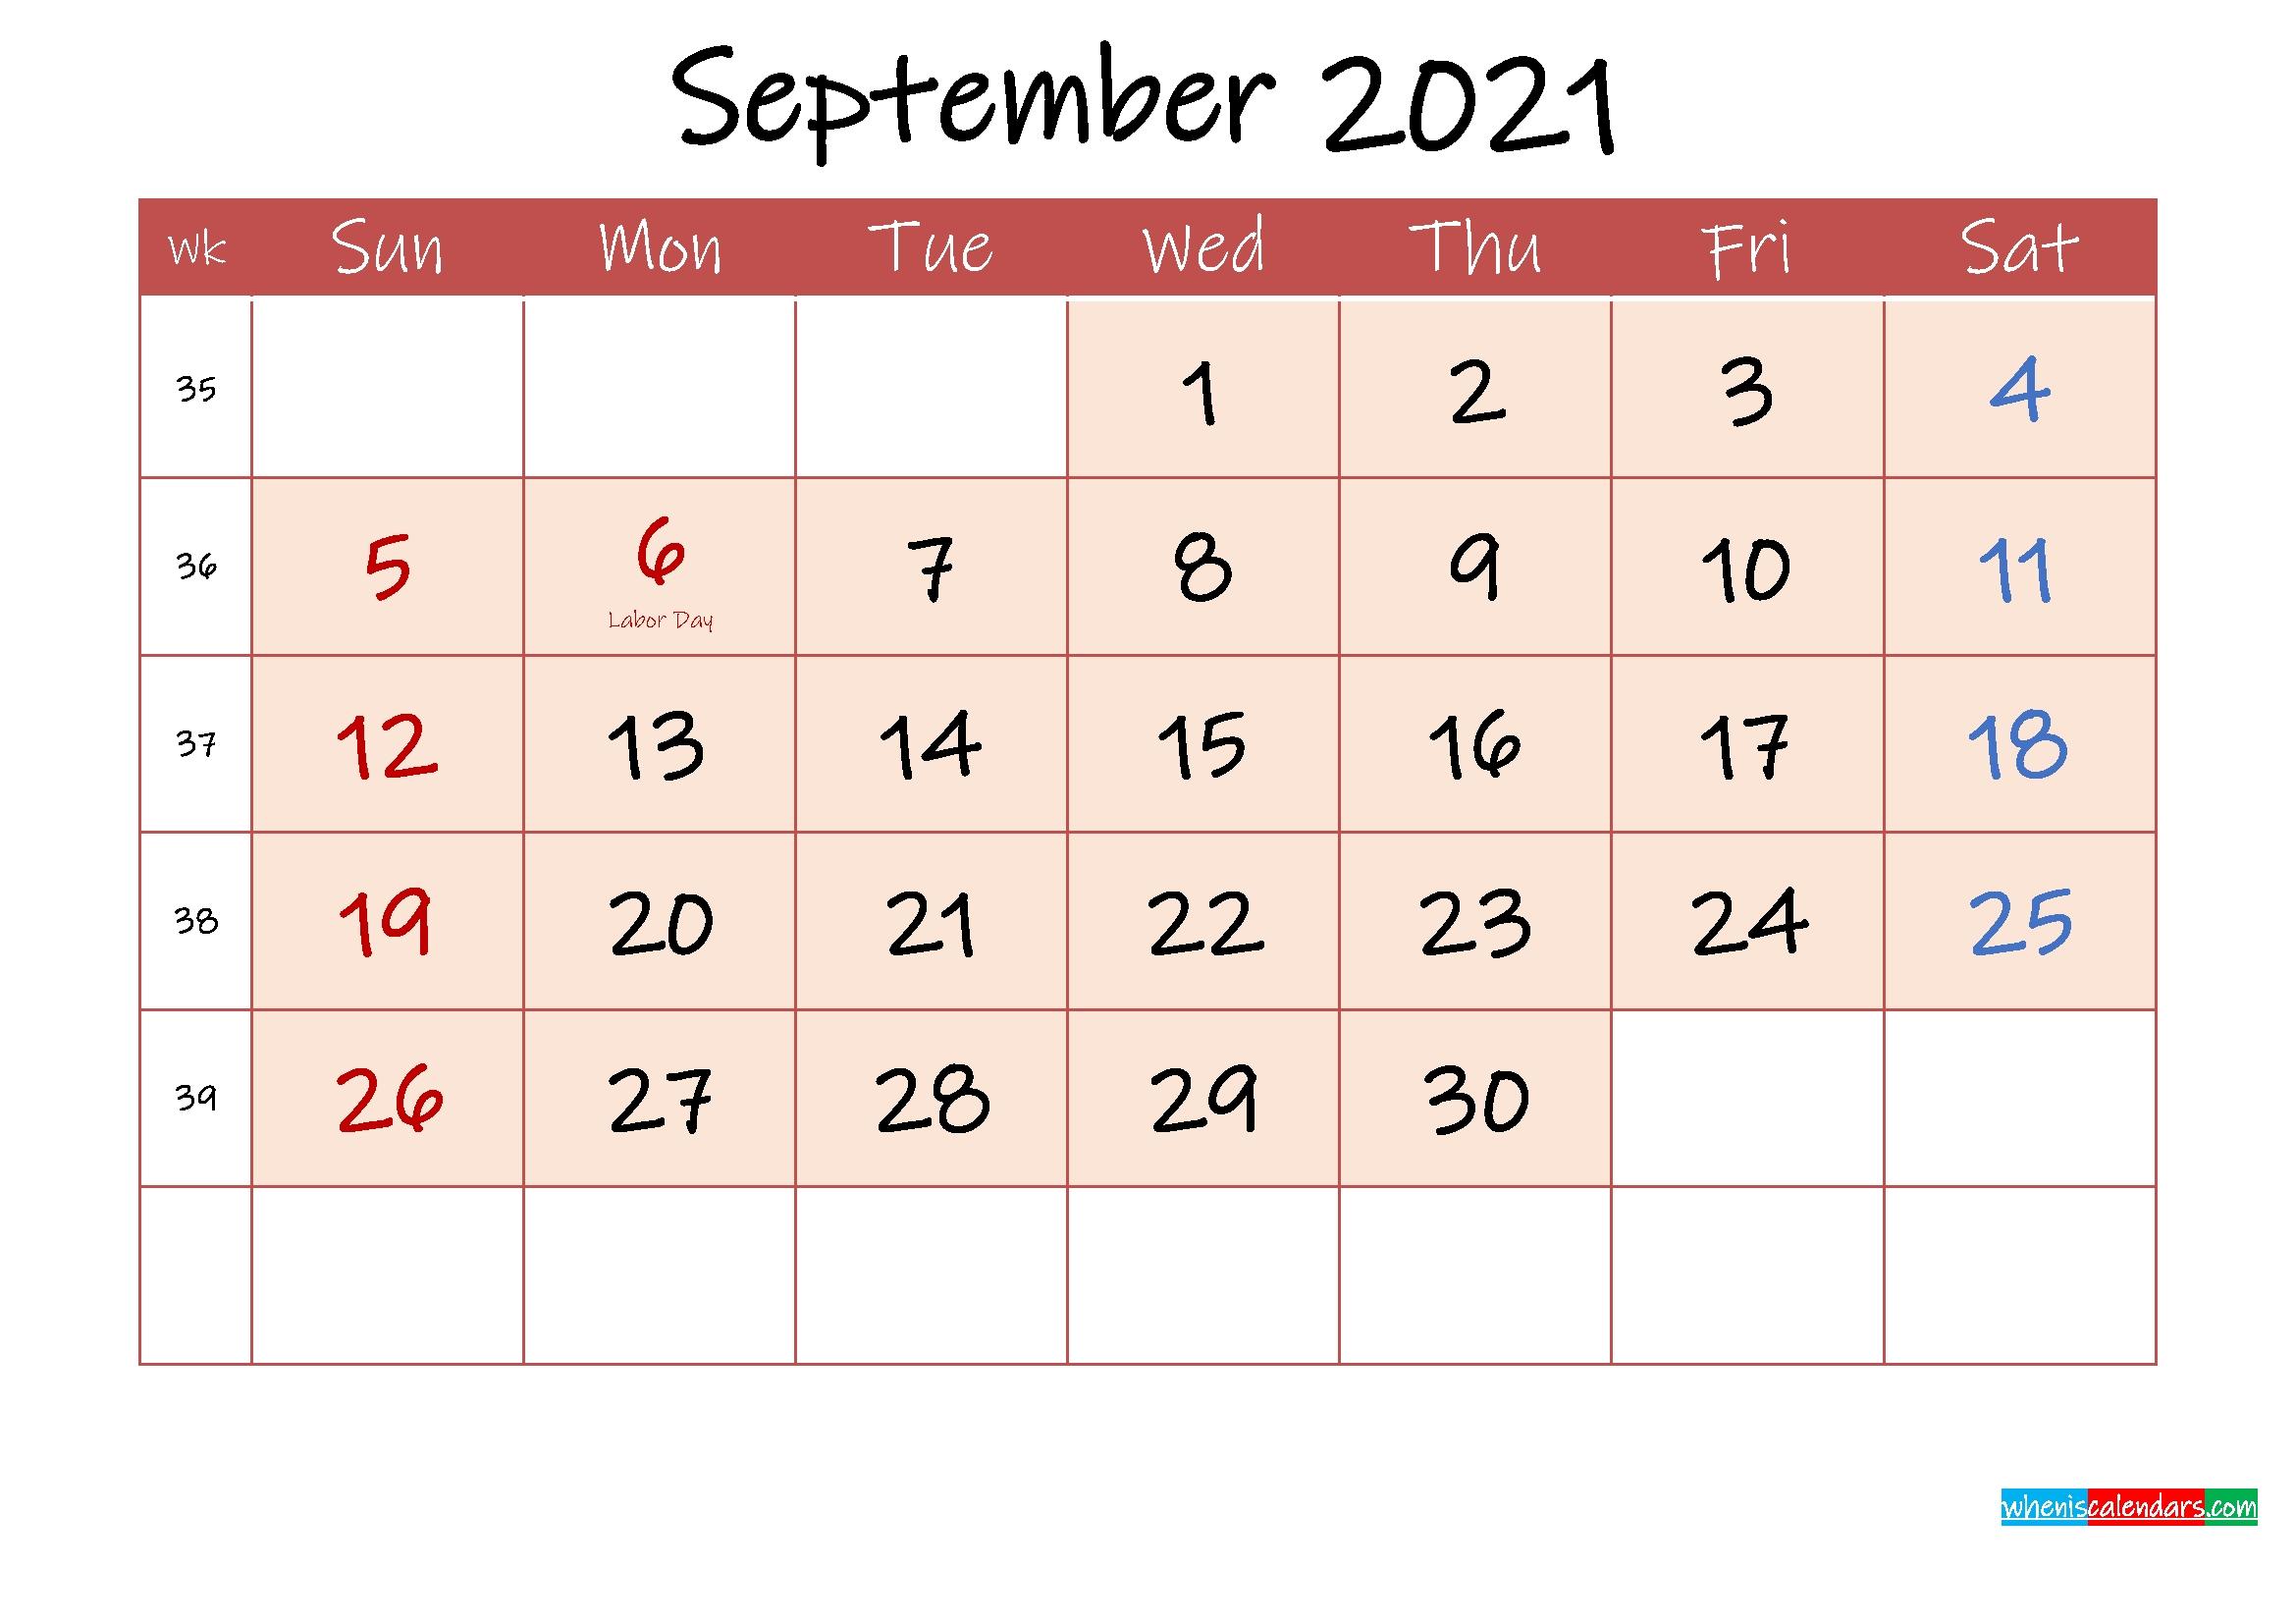 Free Printable September 2021 Calendar With Holidays September 2021 Calendar With Holidays Printable